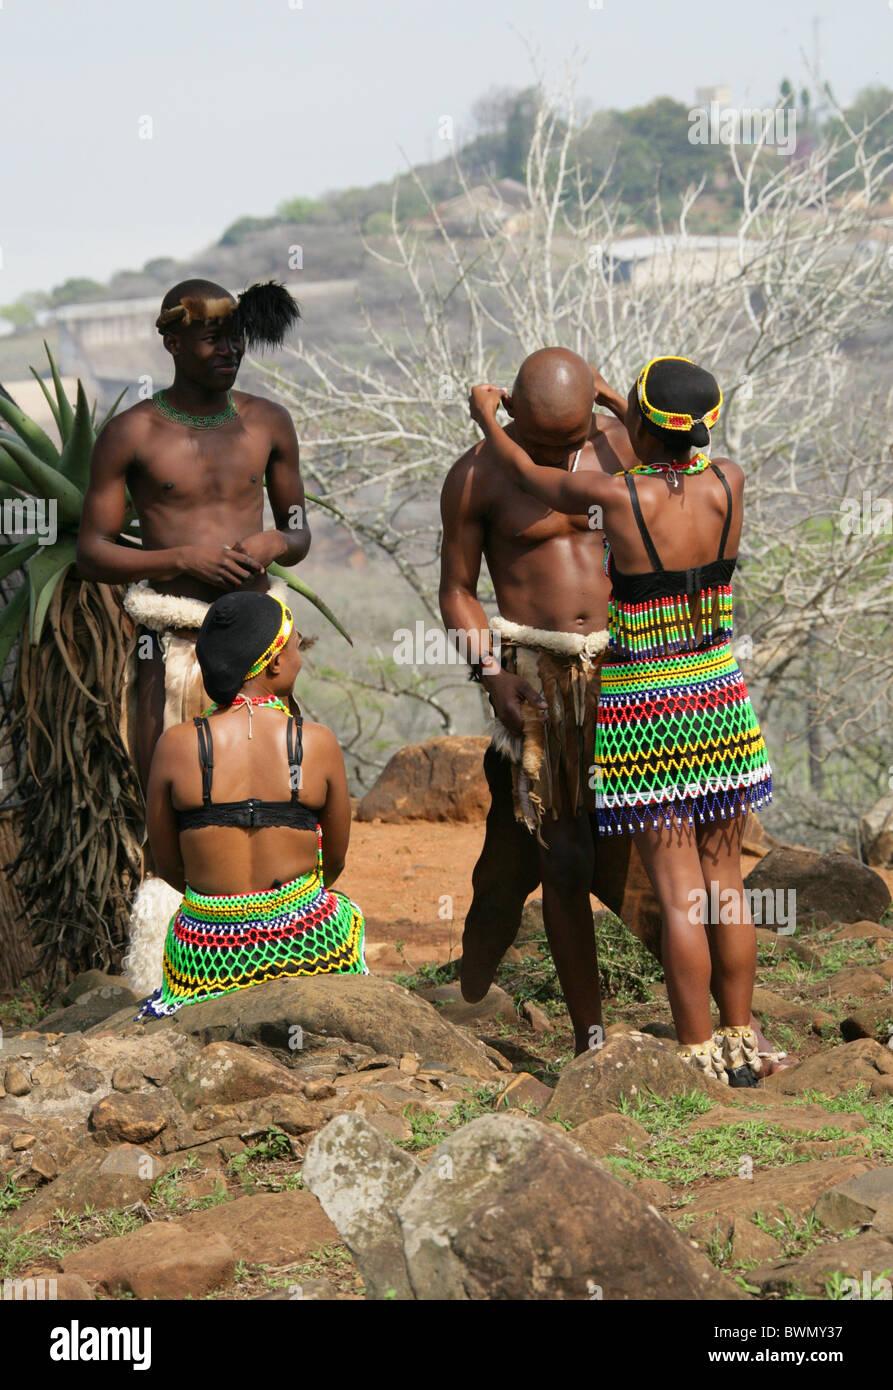 Young Zulu Maiden Giving a Zulu Warrior a Betrothal Necklace, Shakaland Zulu Village, Nkwalini Valley, Kwazulu Natal, - Stock Image